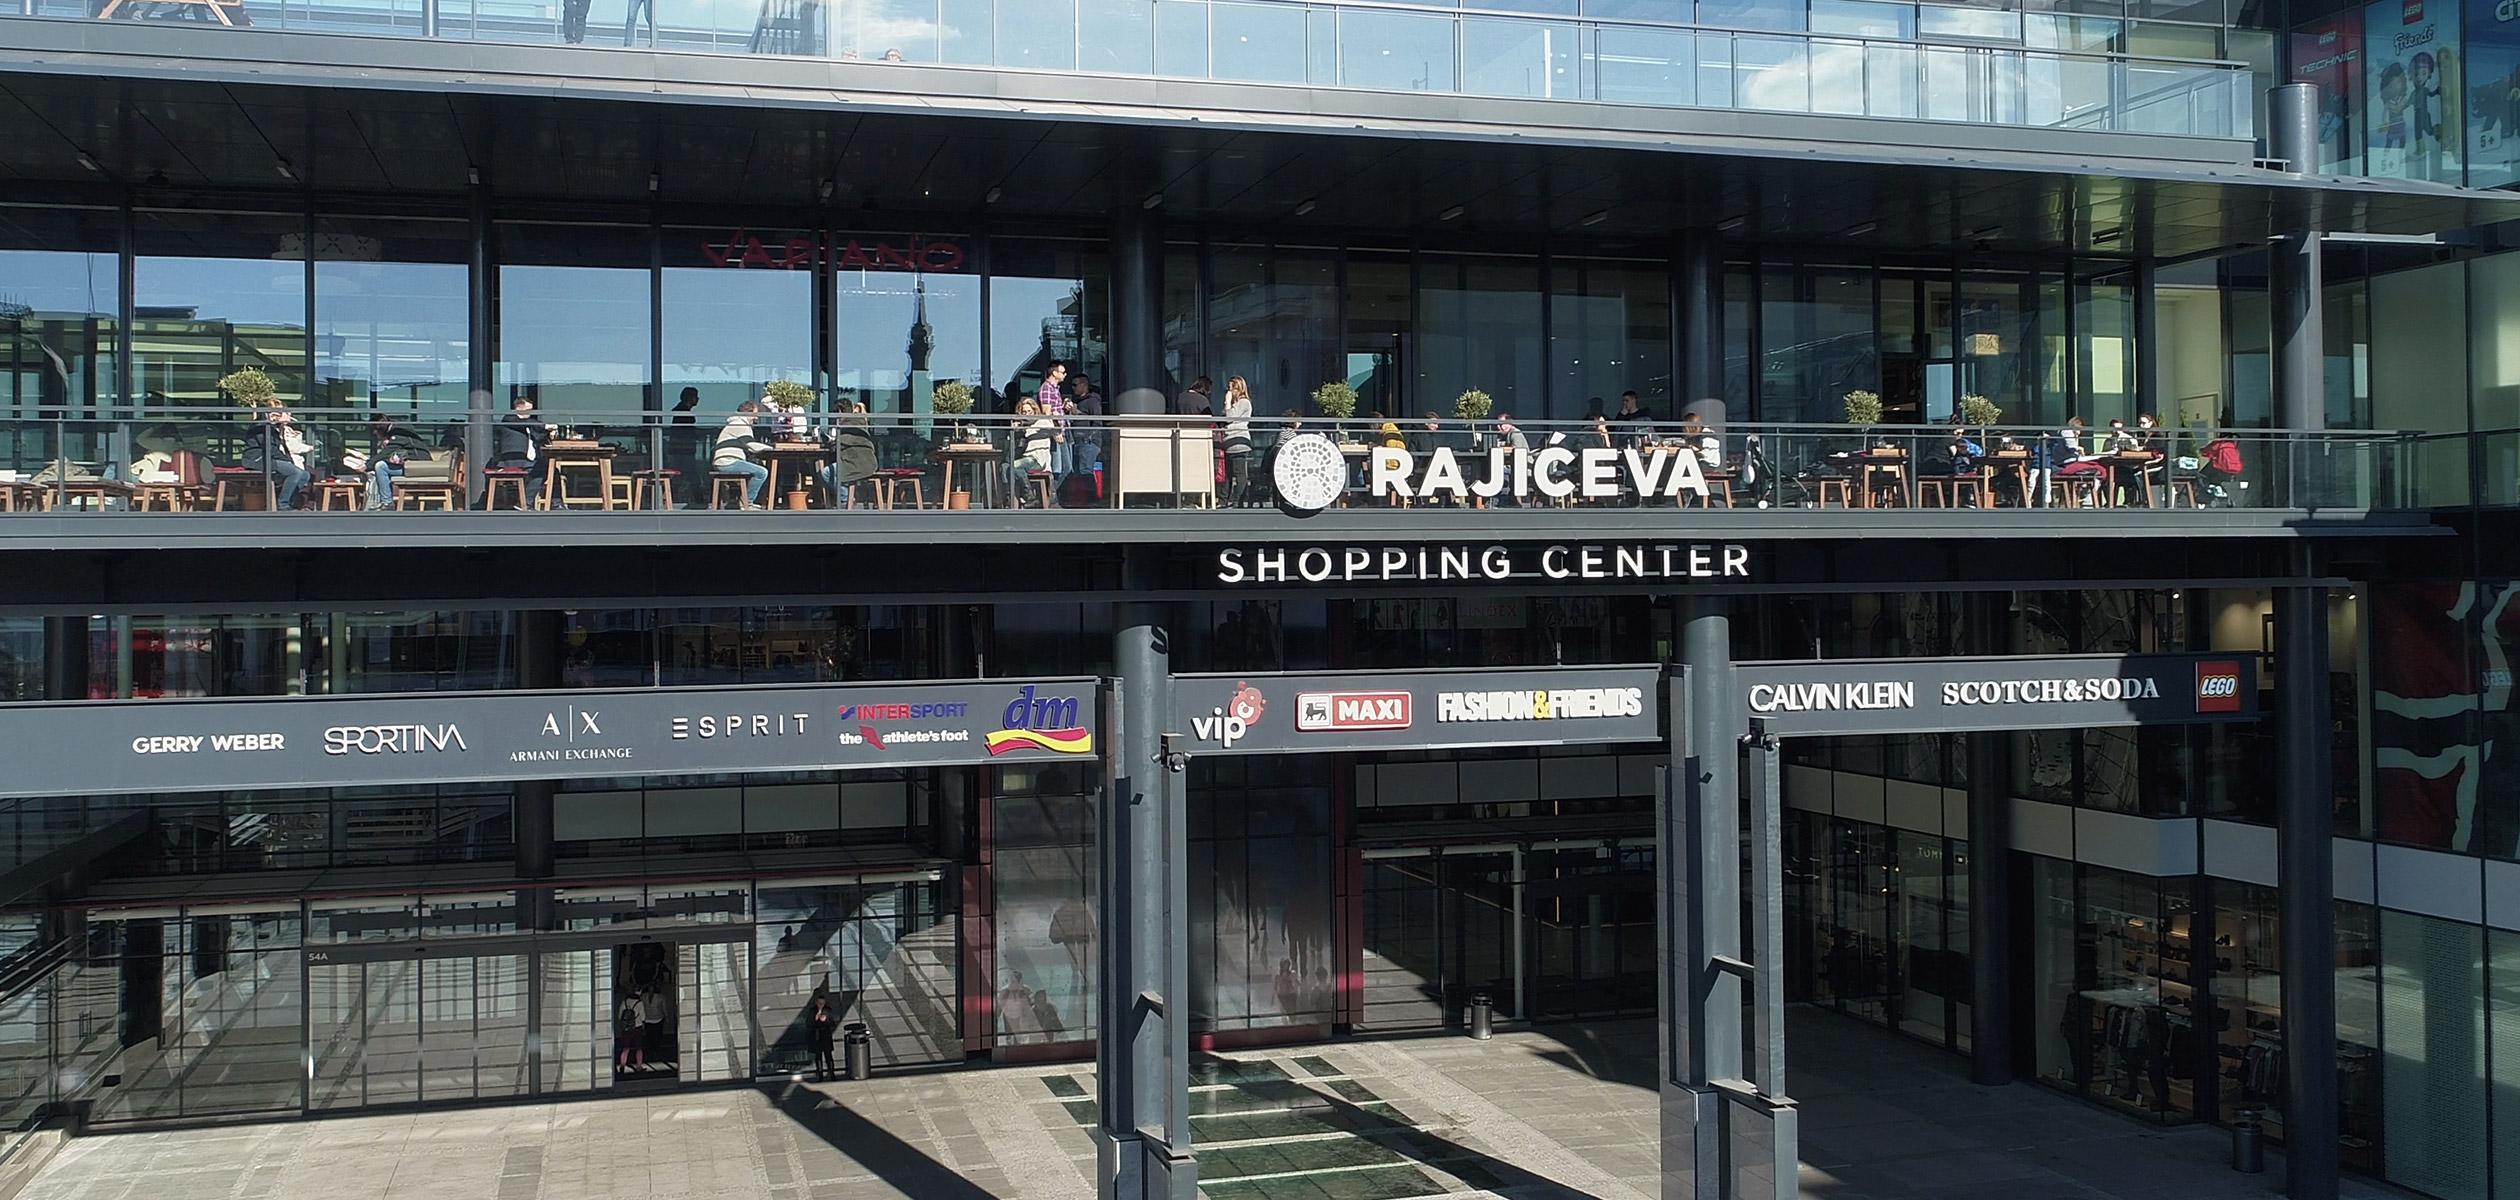 rajiceva-shopping-centar.jpg